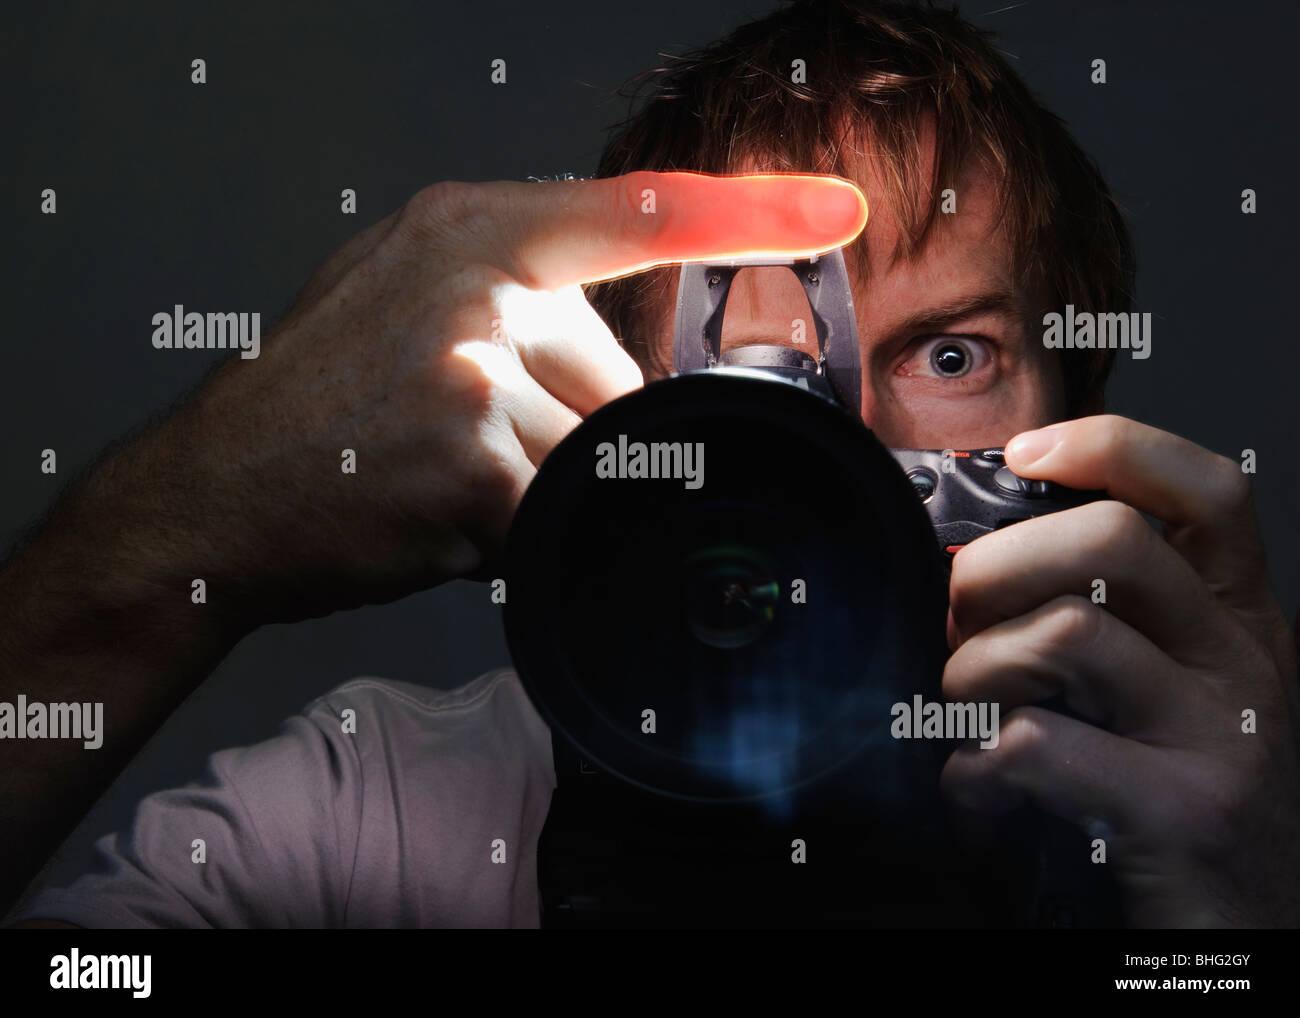 self portrait of a man - Stock Image